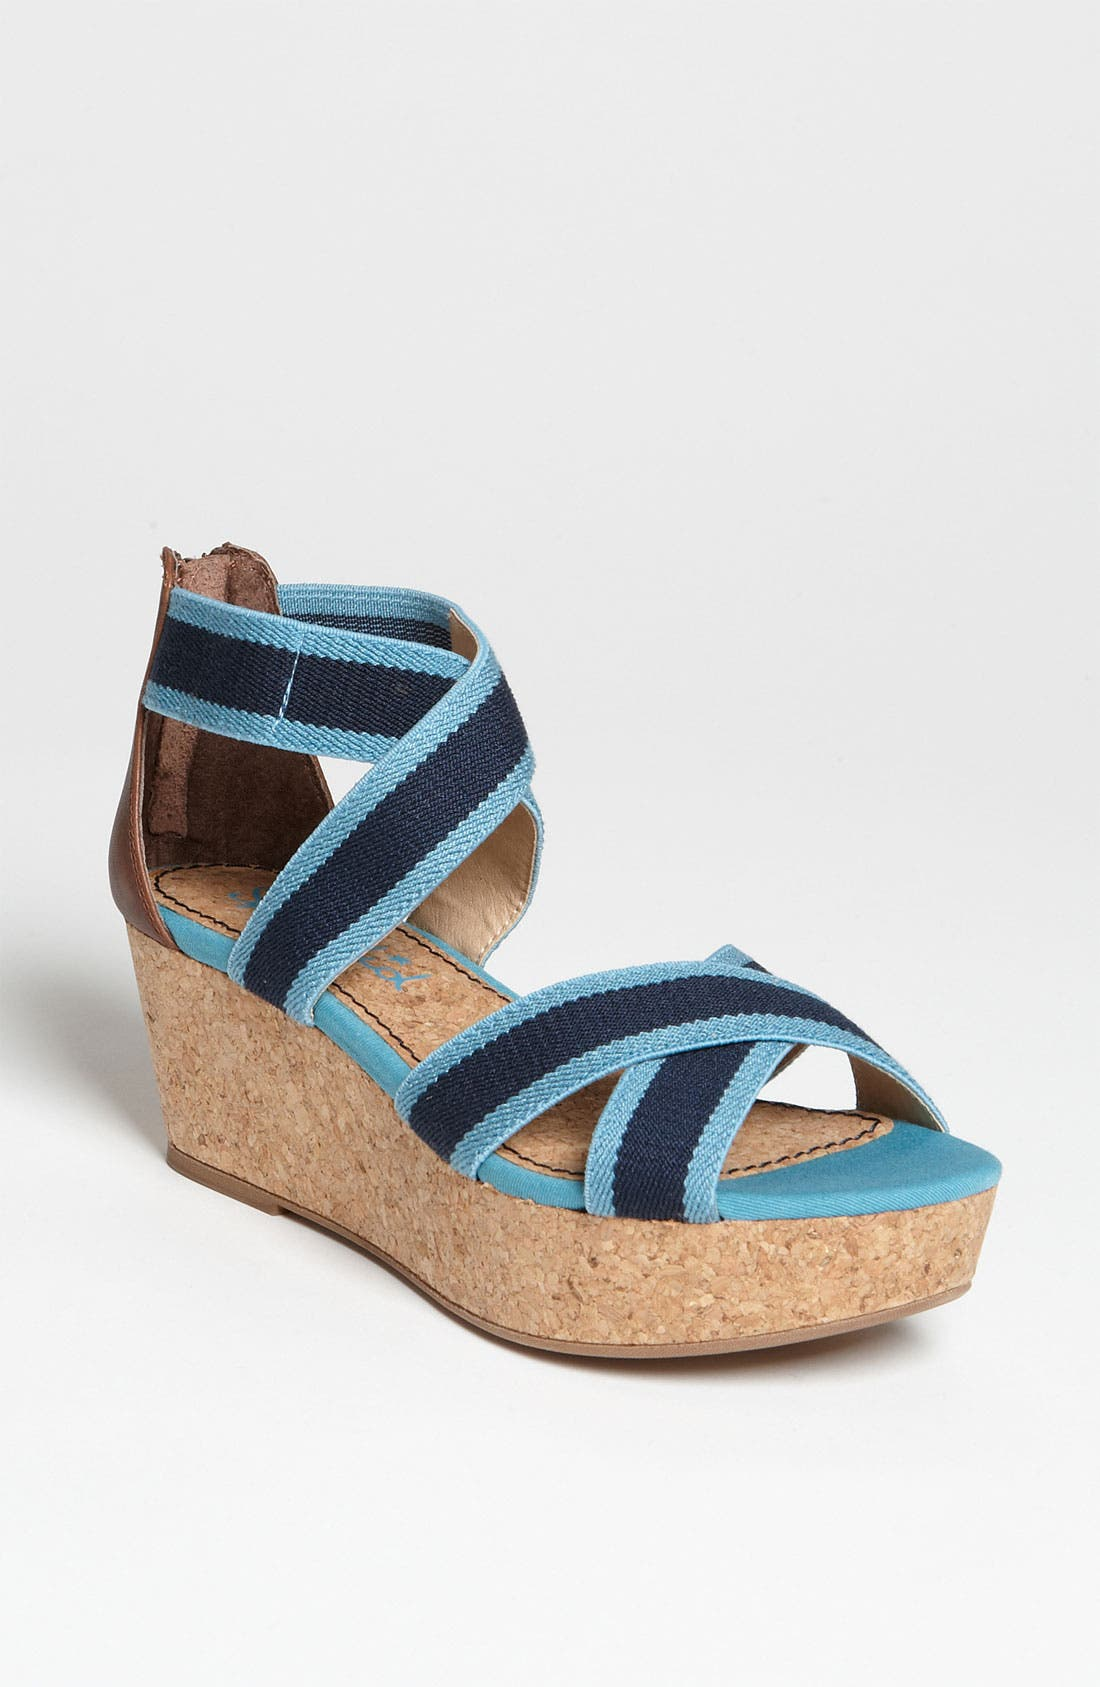 Alternate Image 1 Selected - Splendid 'Wishful' Platform Sandal